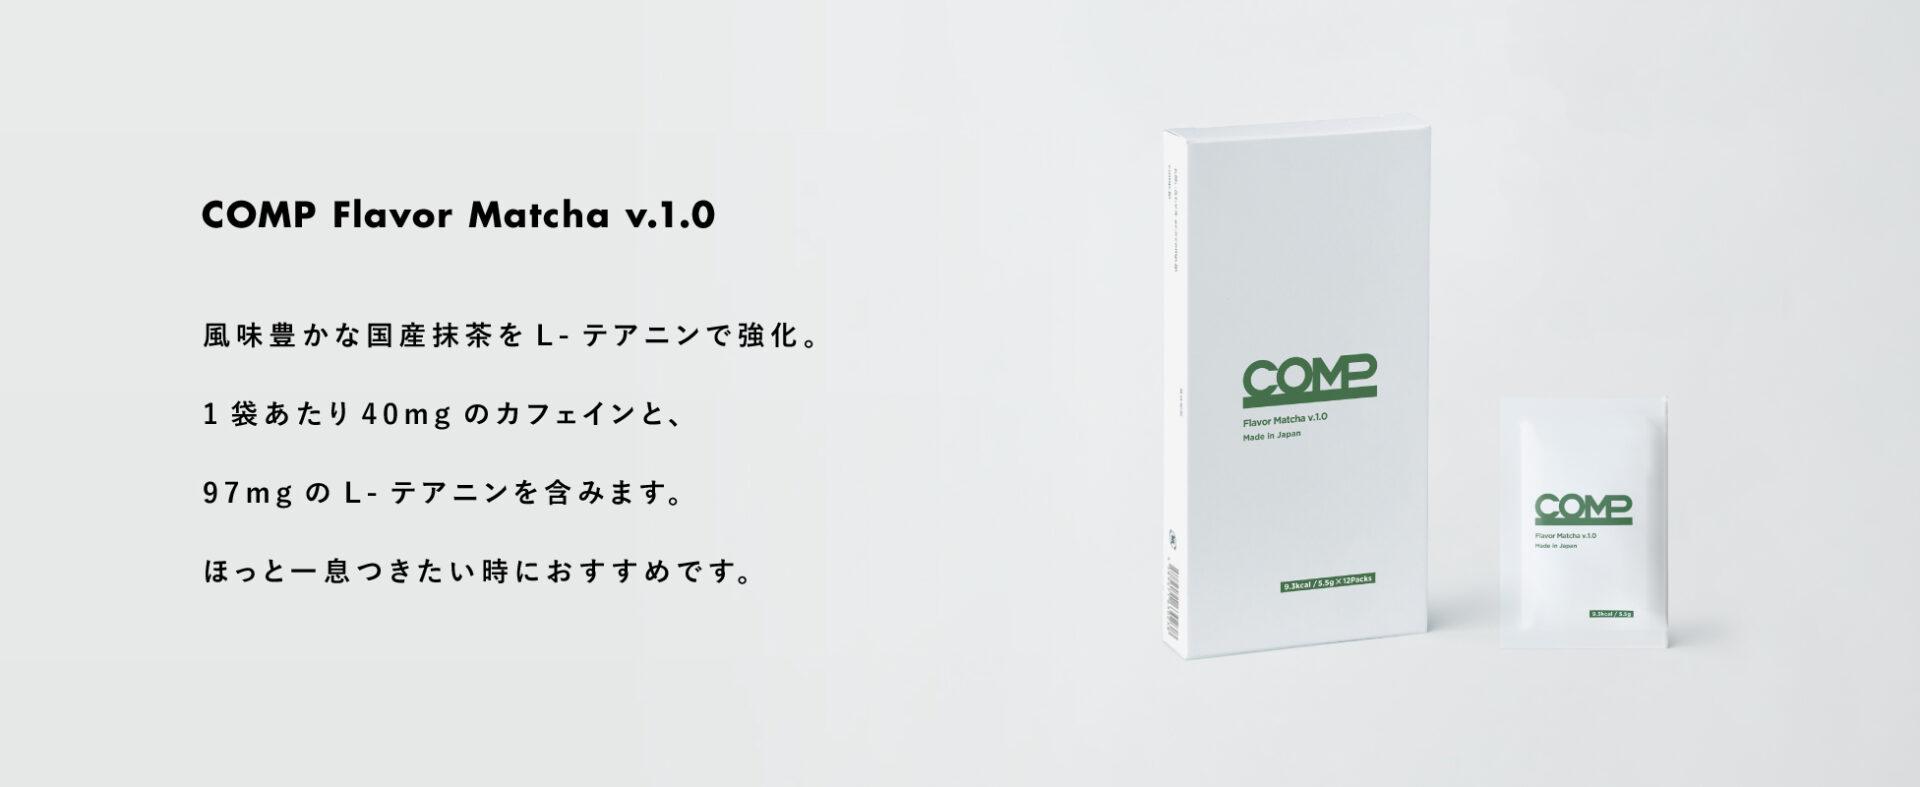 COMP Flavor(コンプフレーバー)_4つの風味_抹茶風味公式サイト説明